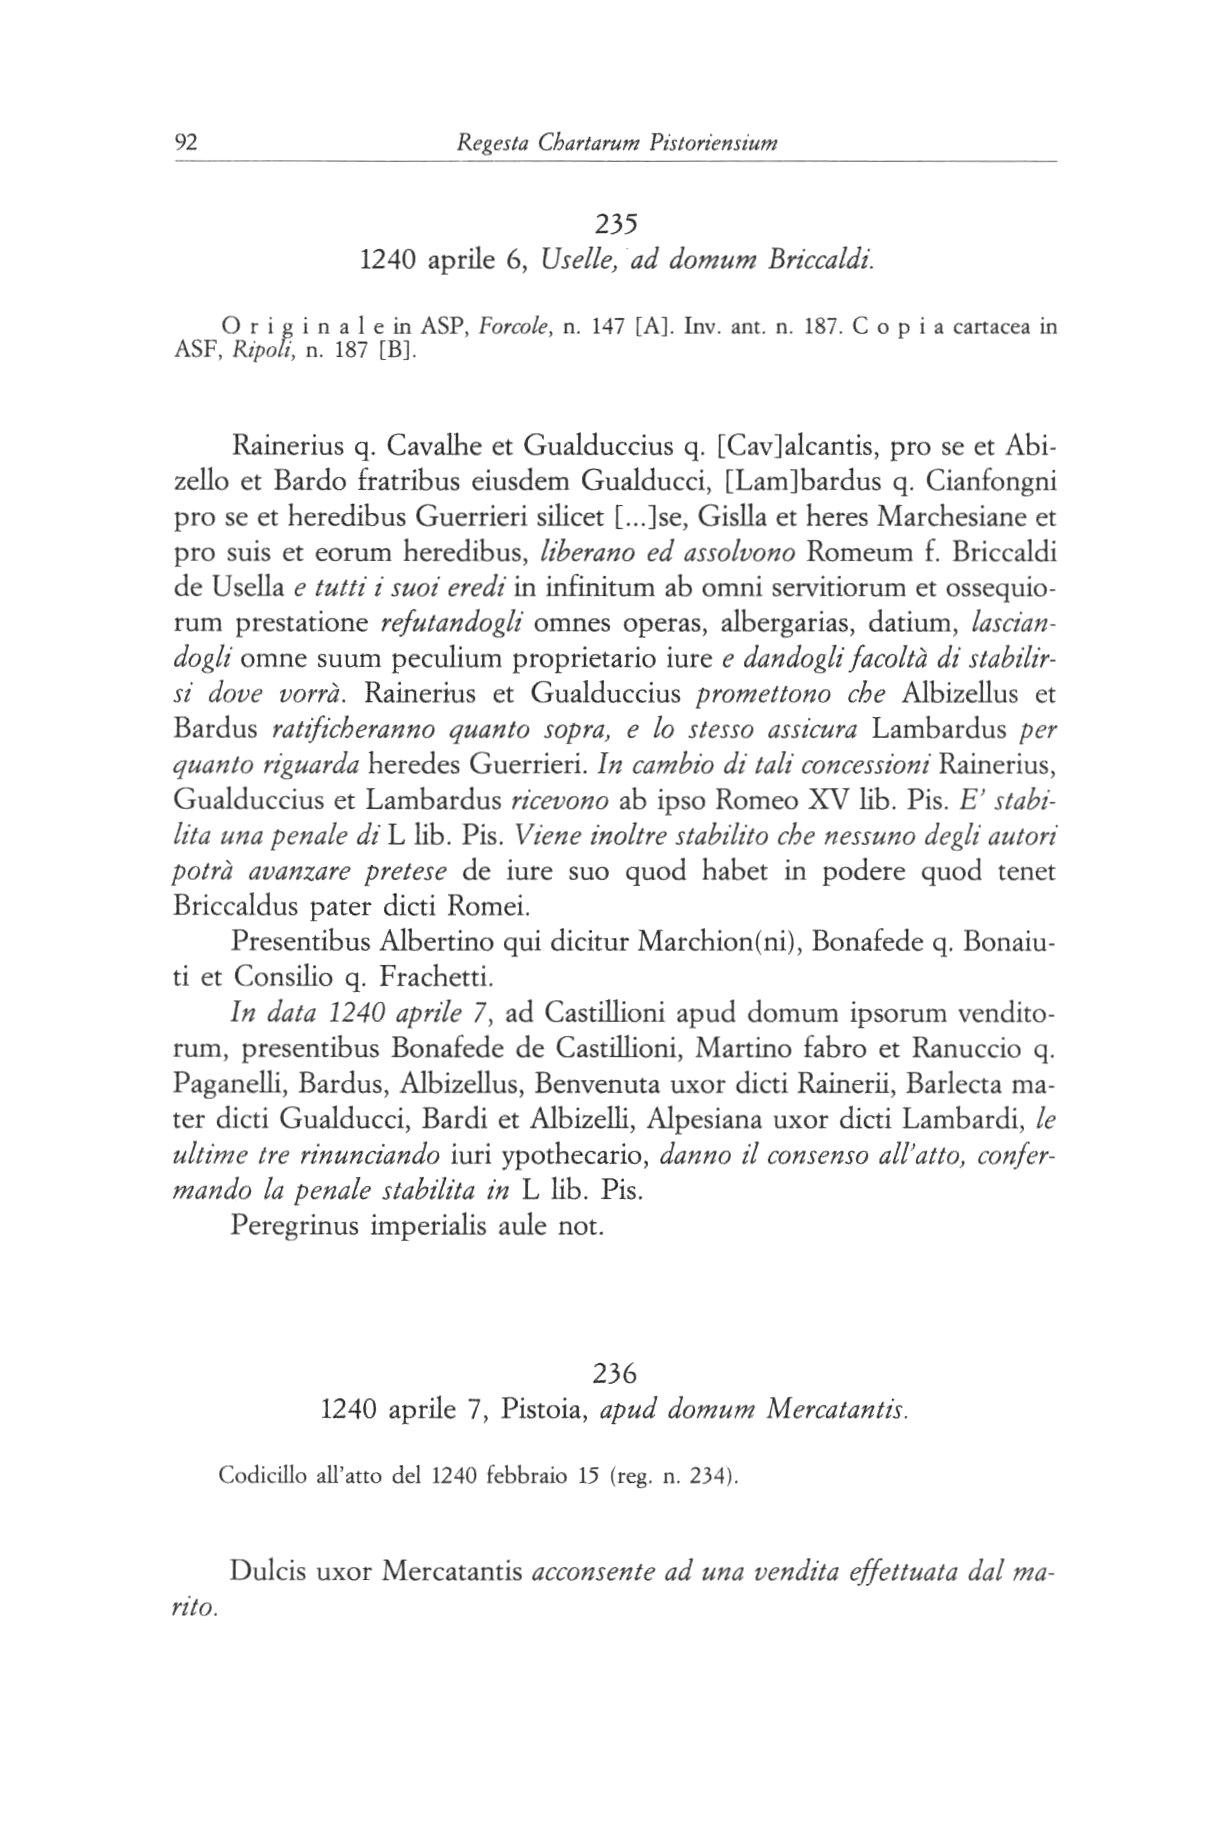 Monastero Forcole 0092.jpg